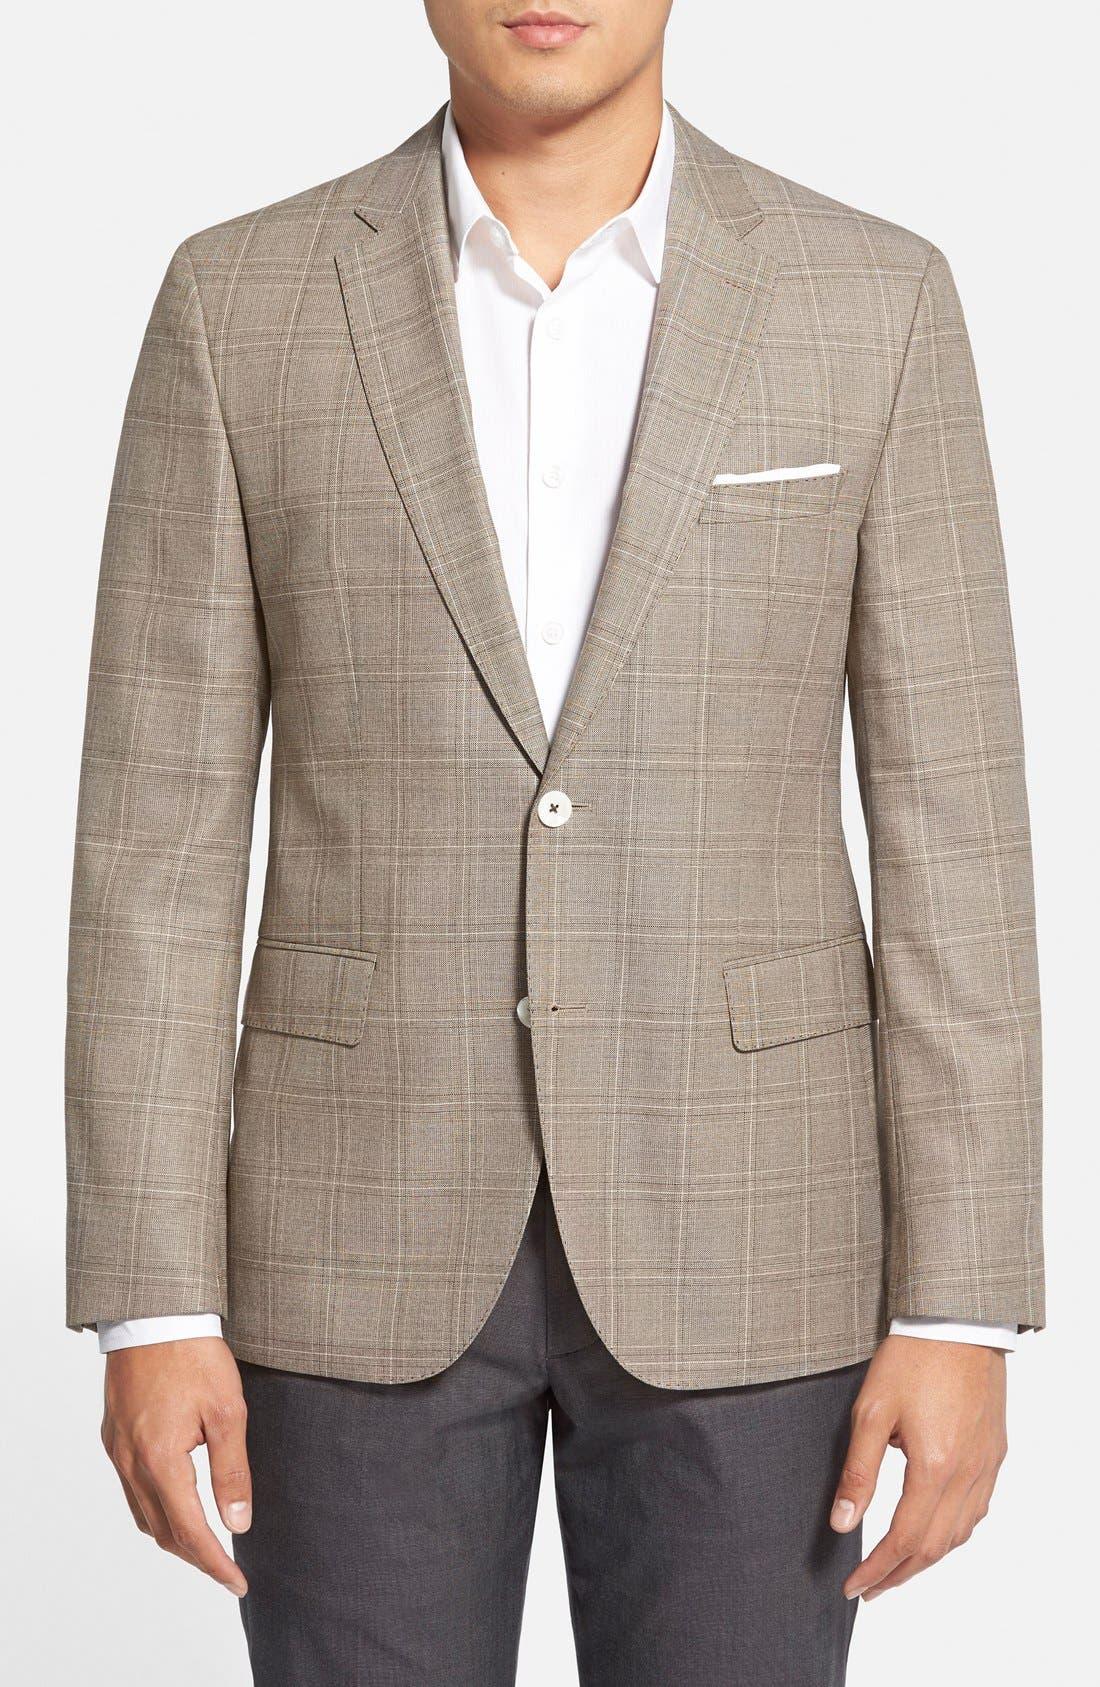 Alternate Image 1 Selected - BOSS 'Jarett' Trim Fit Plaid Wool Blend Sport Coat